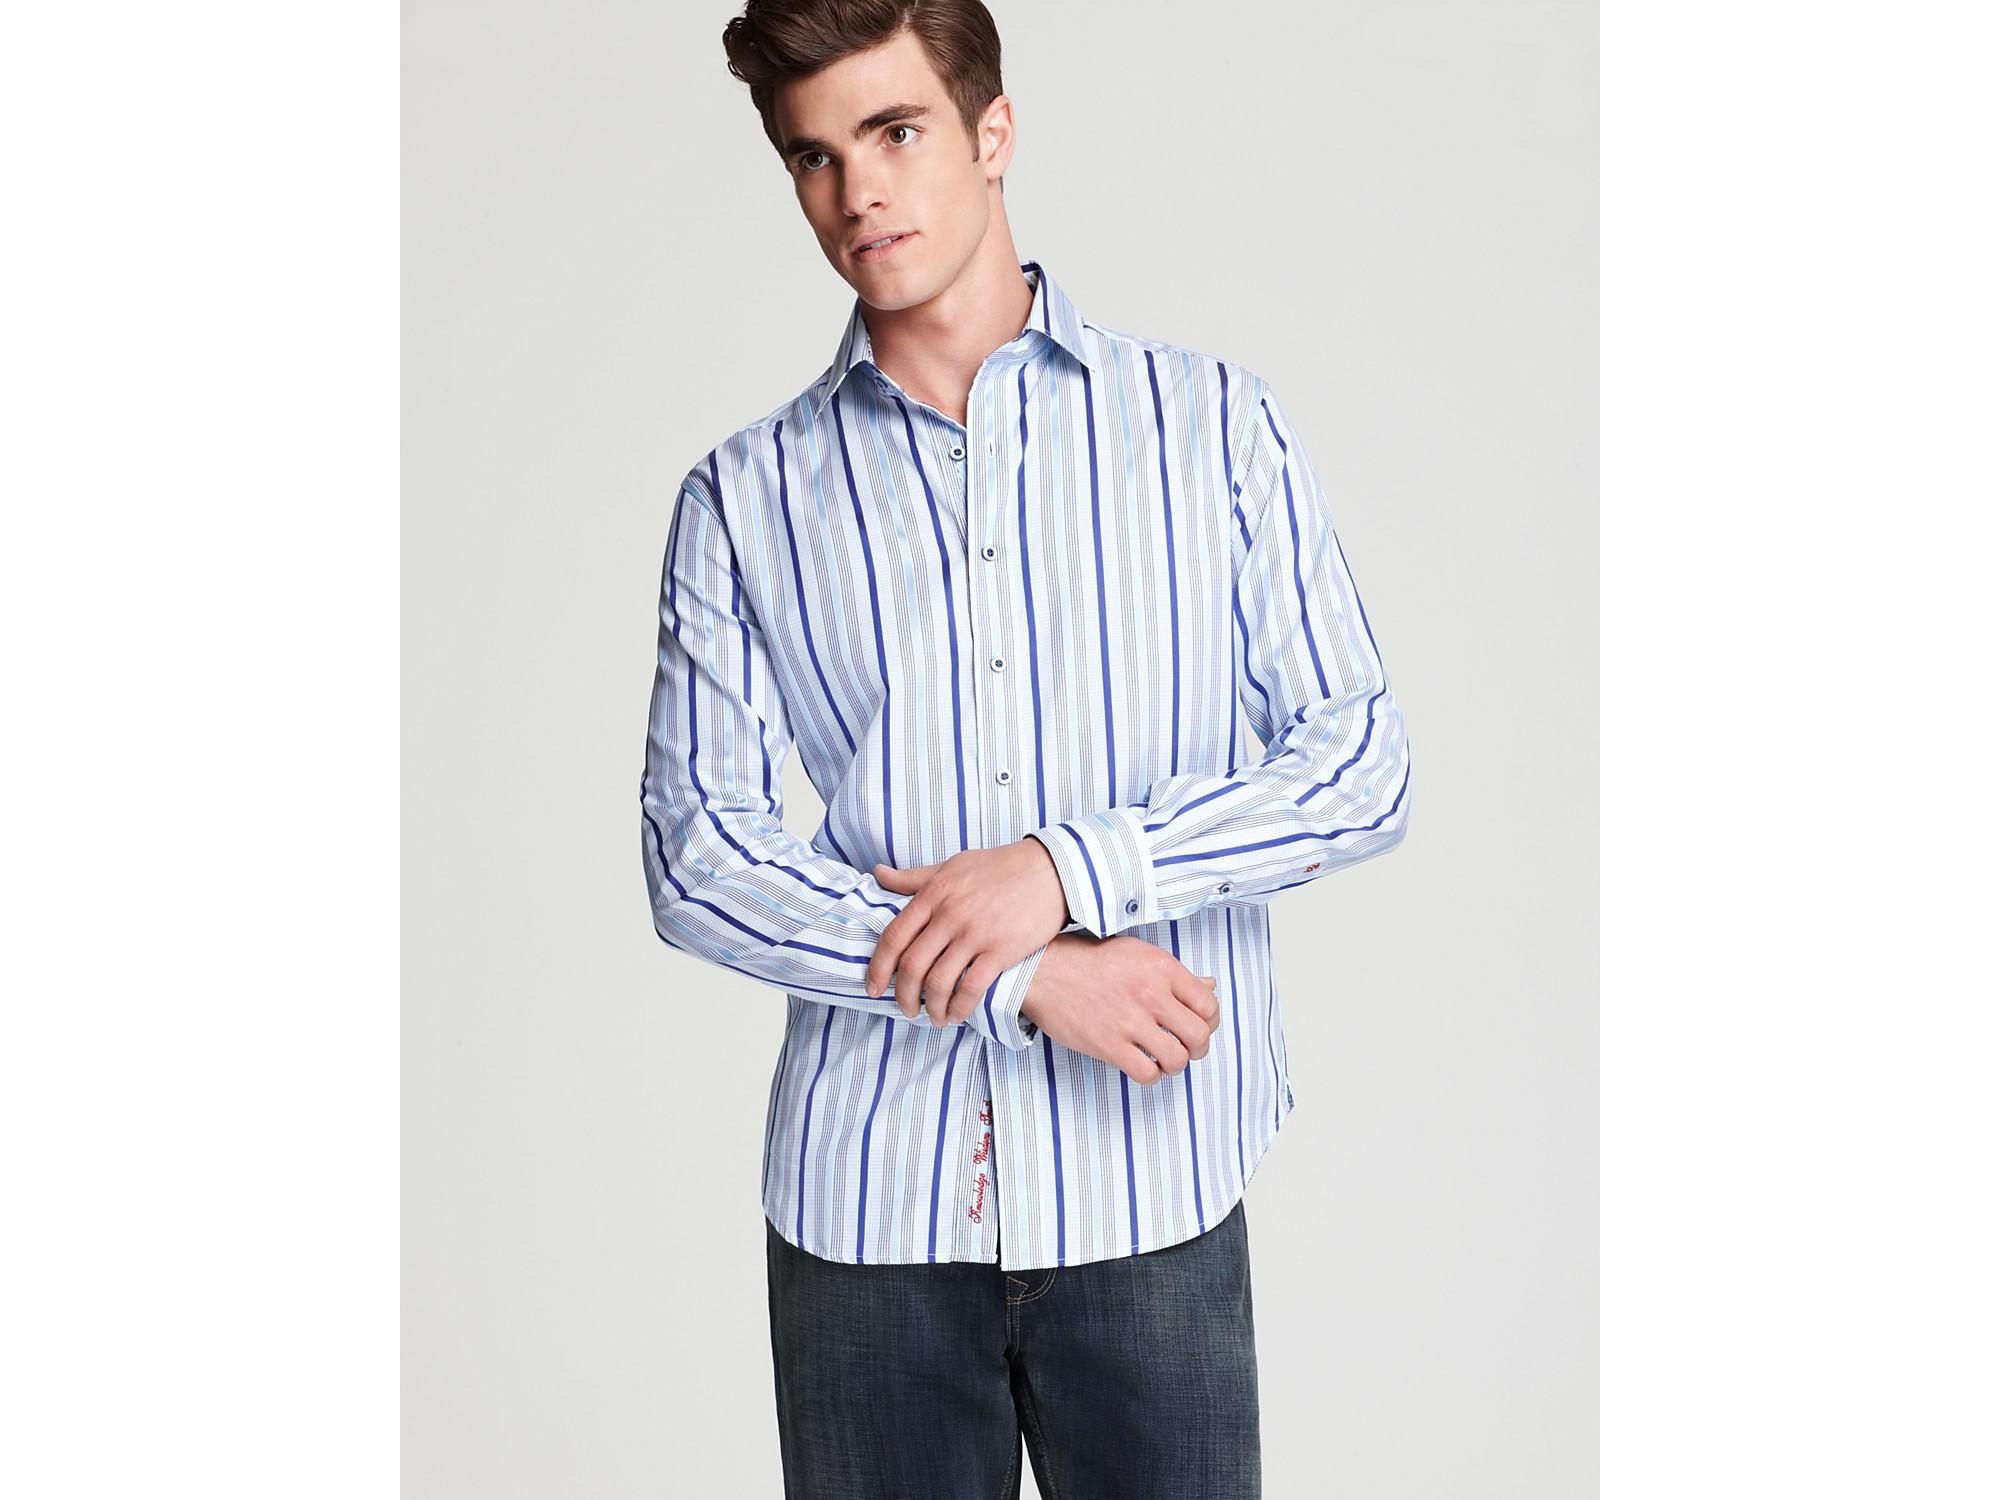 Robert graham buckingham sport shirt classic fit in blue for Robert graham sport shirt